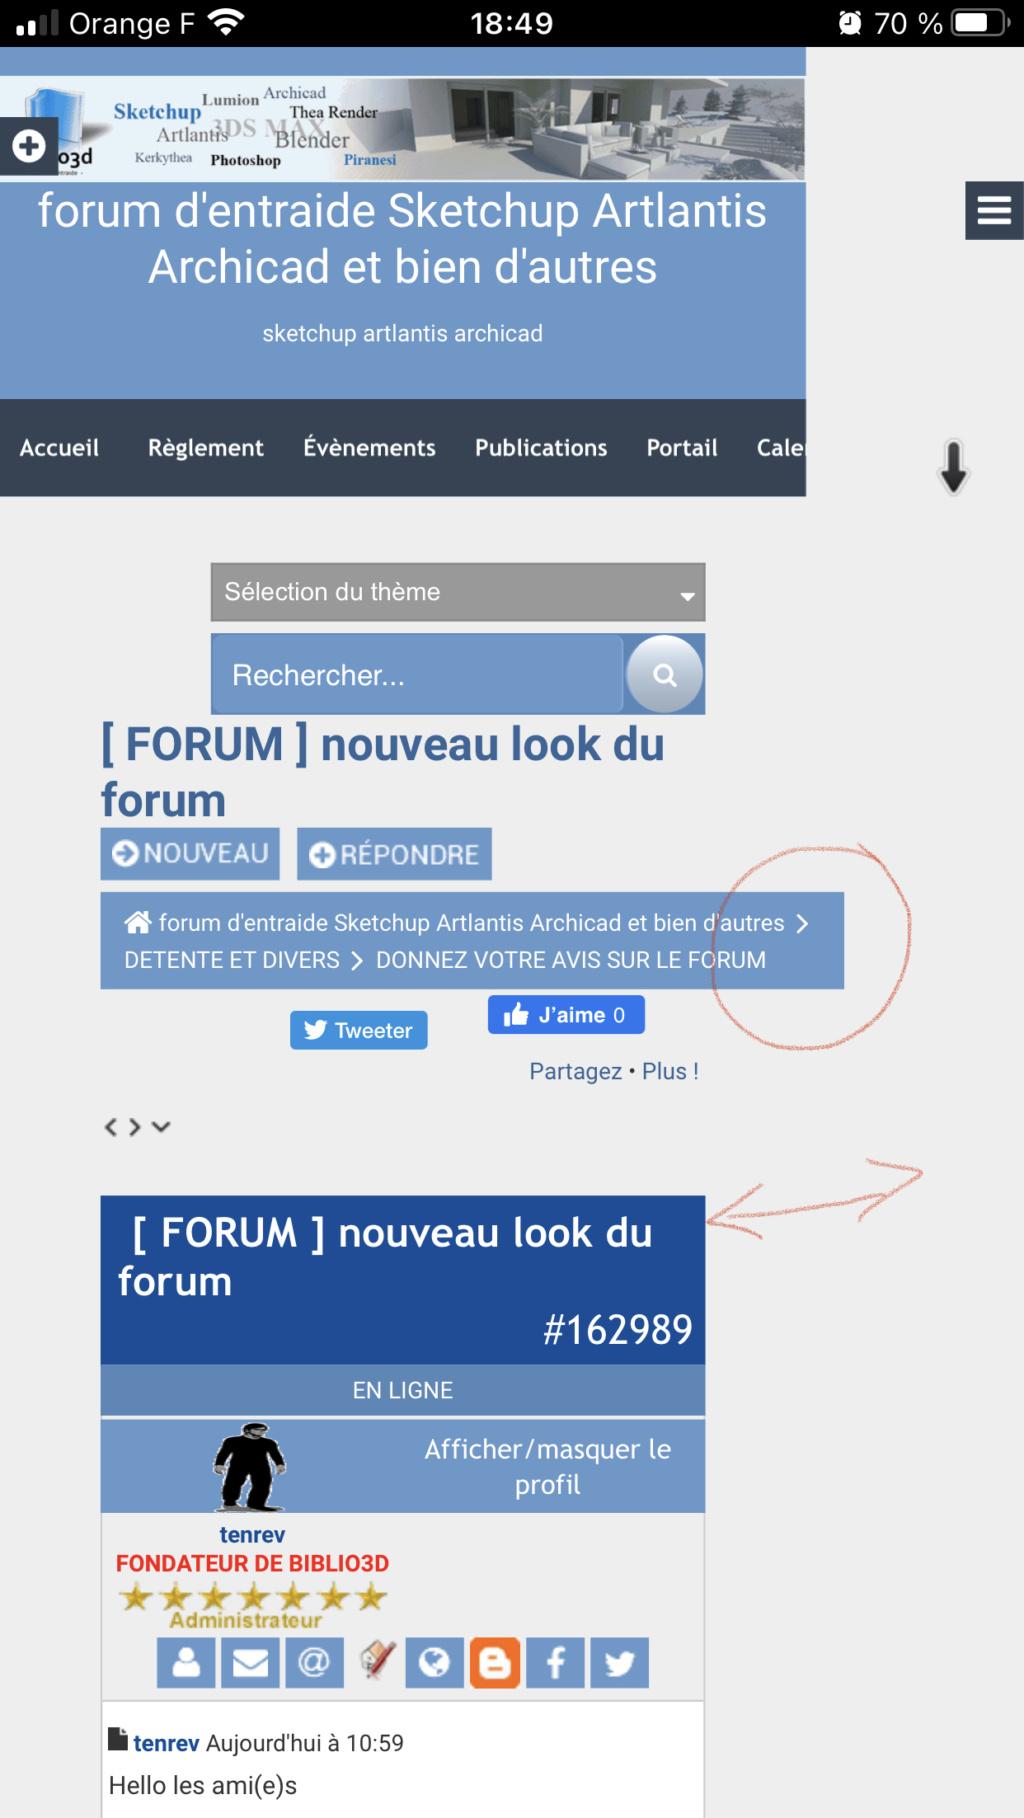 [ FORUM ] essai de futur design du forum  - Page 3 Bb4efc10